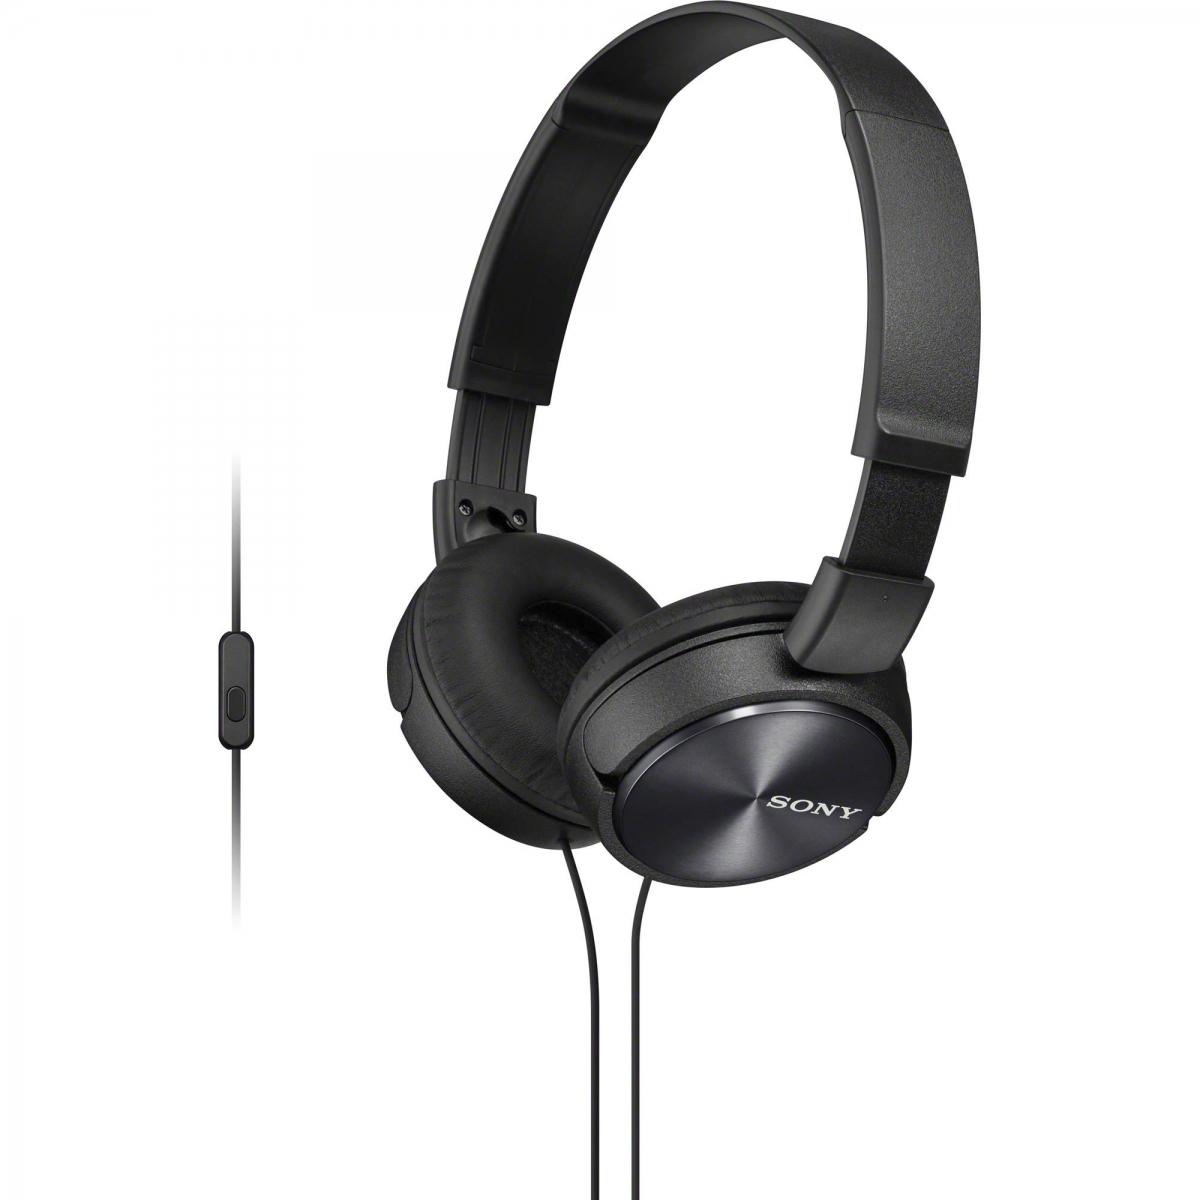 Trhák SONY sluchátka MDR-ZX310AP s handsfree, černá - černá MDRZX310APB.CE7